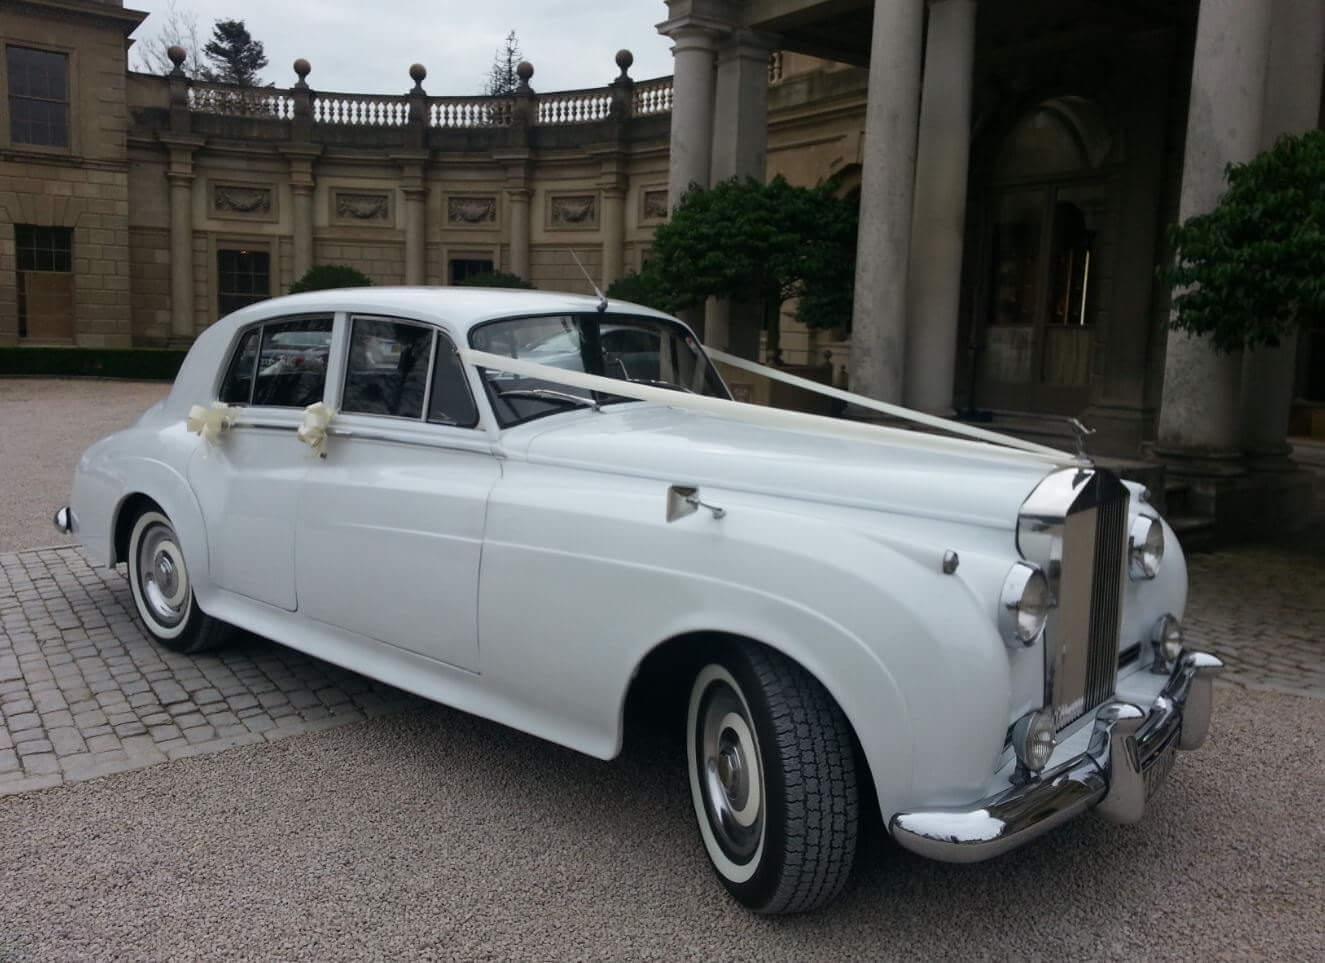 Classic Wedding Car - 2 Passengers Image